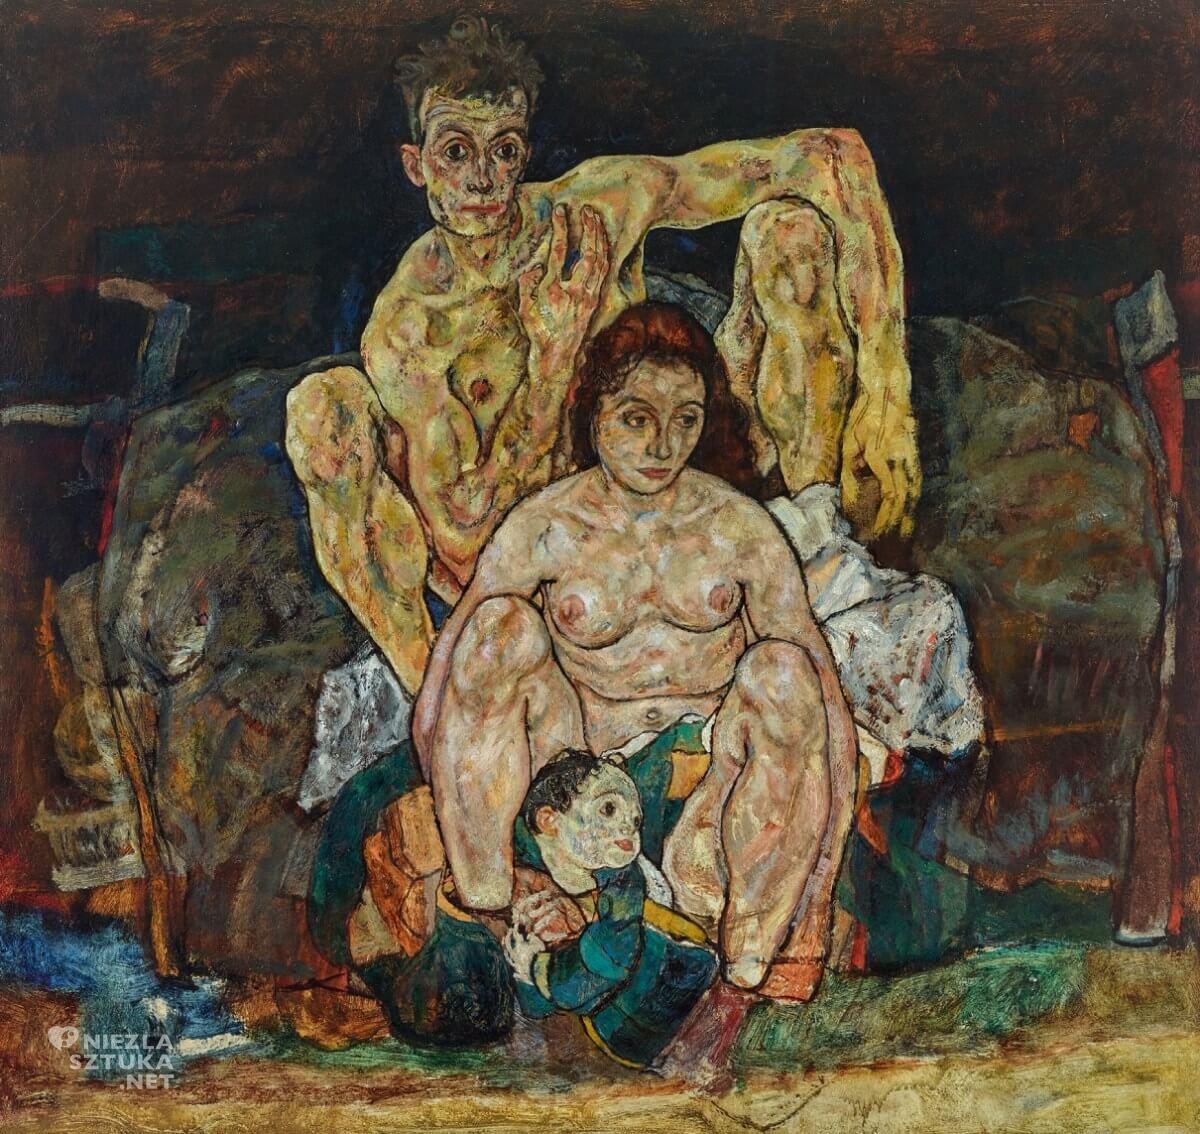 Egon Schiele, Kucająca para, rodzina, sztuka austriacka, Niezła Sztuka